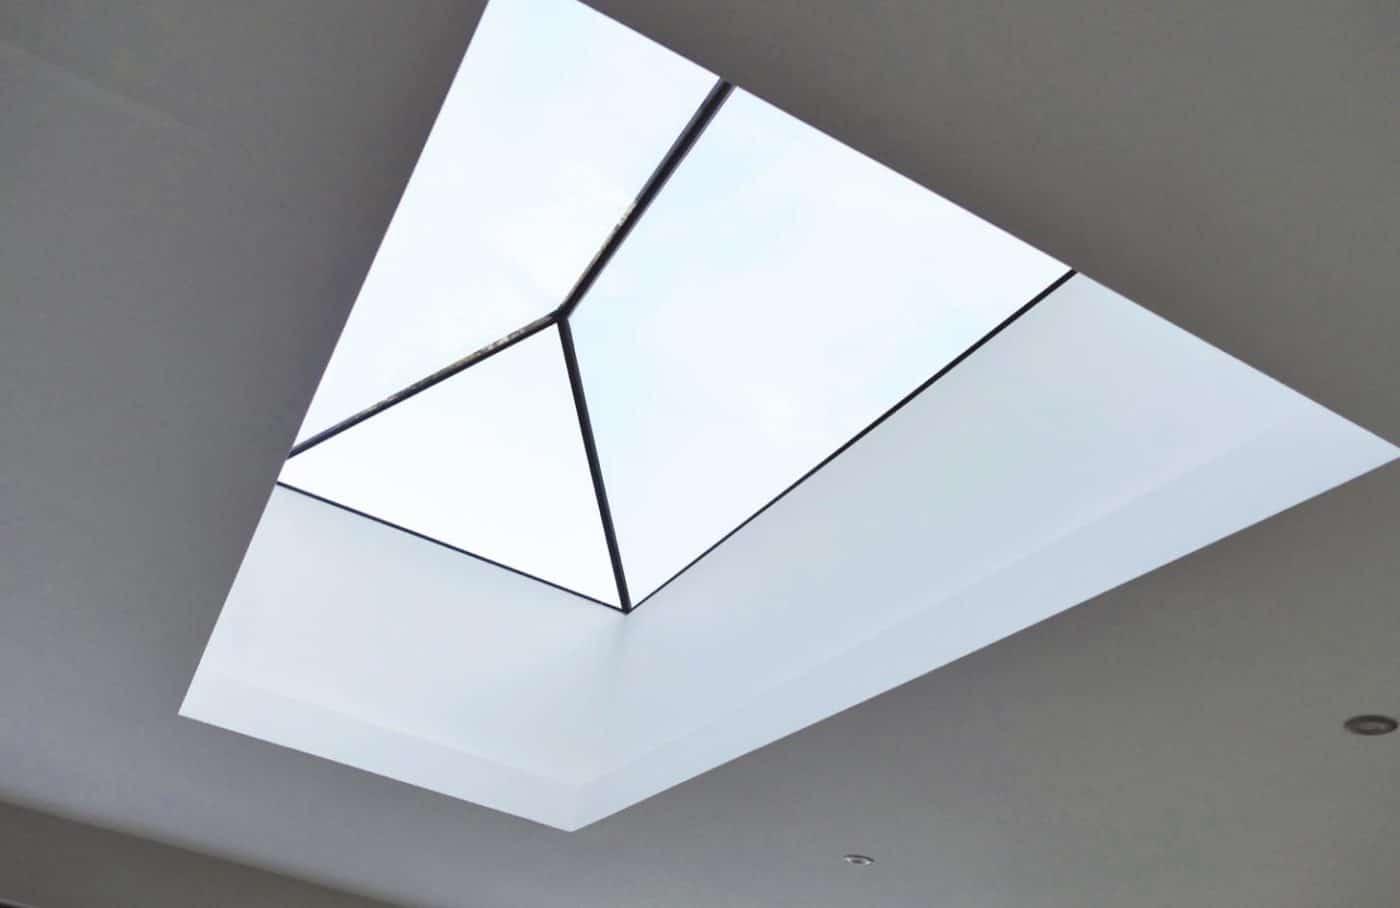 Frameless glass lanterns from IDSystems